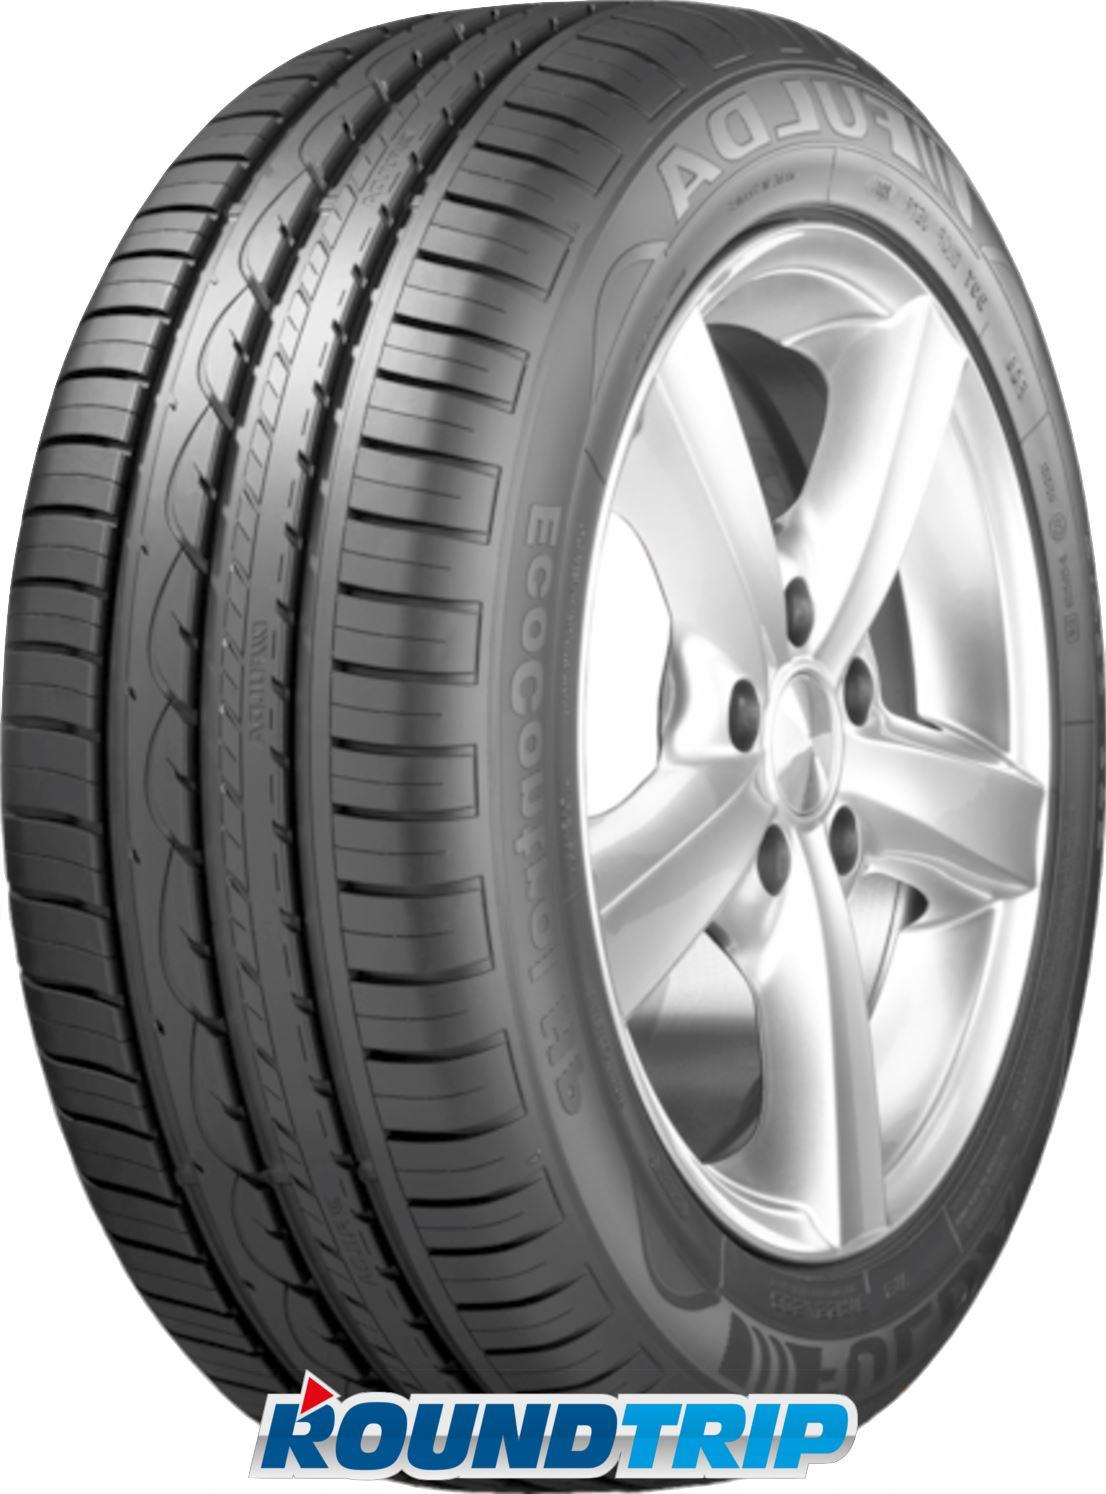 4x Fulda ECO-HP 185 55 R15 82H Auto Reifen Sommer